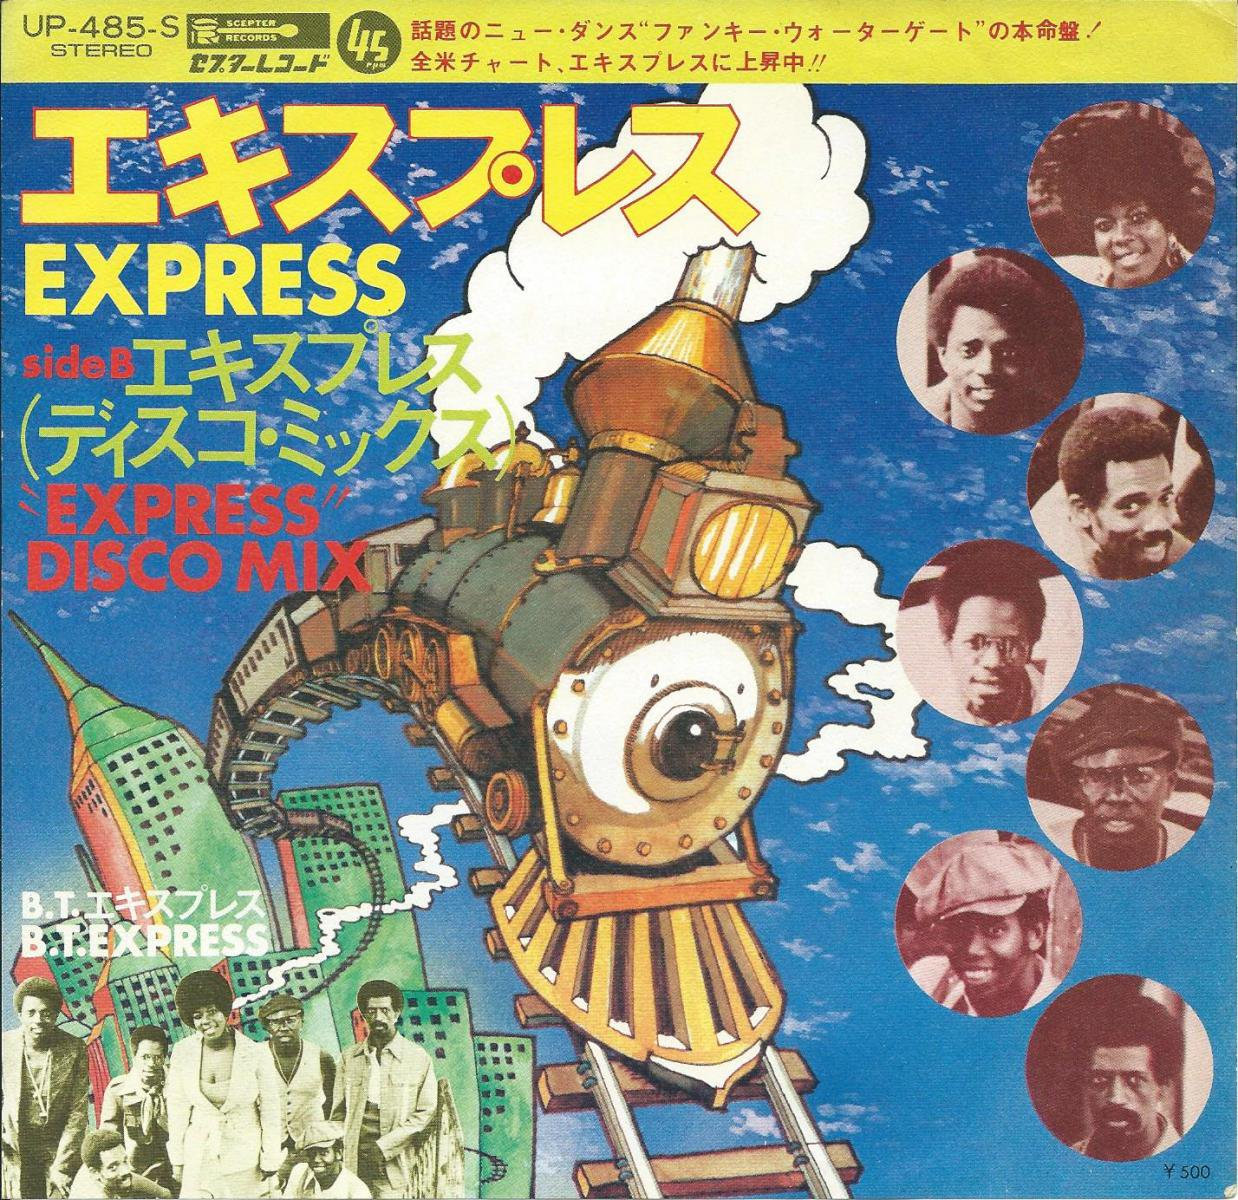 B.T.エキスプレス B.T.EXPRESS / エキスプレス EXPRESS (7